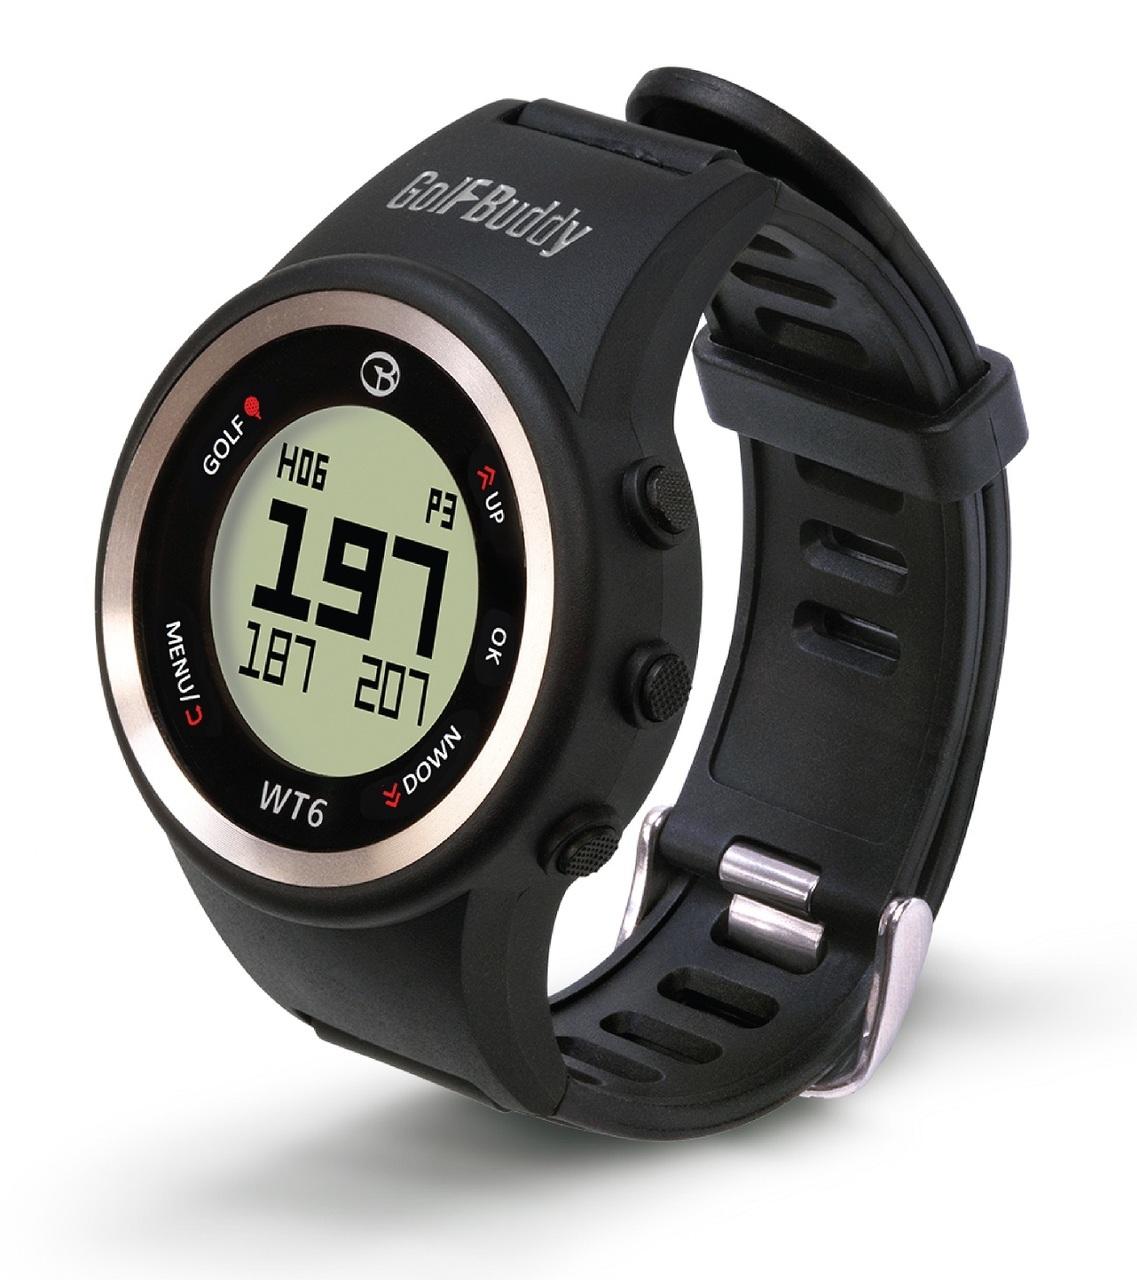 GolfBuddy - WT6 GPS Watch